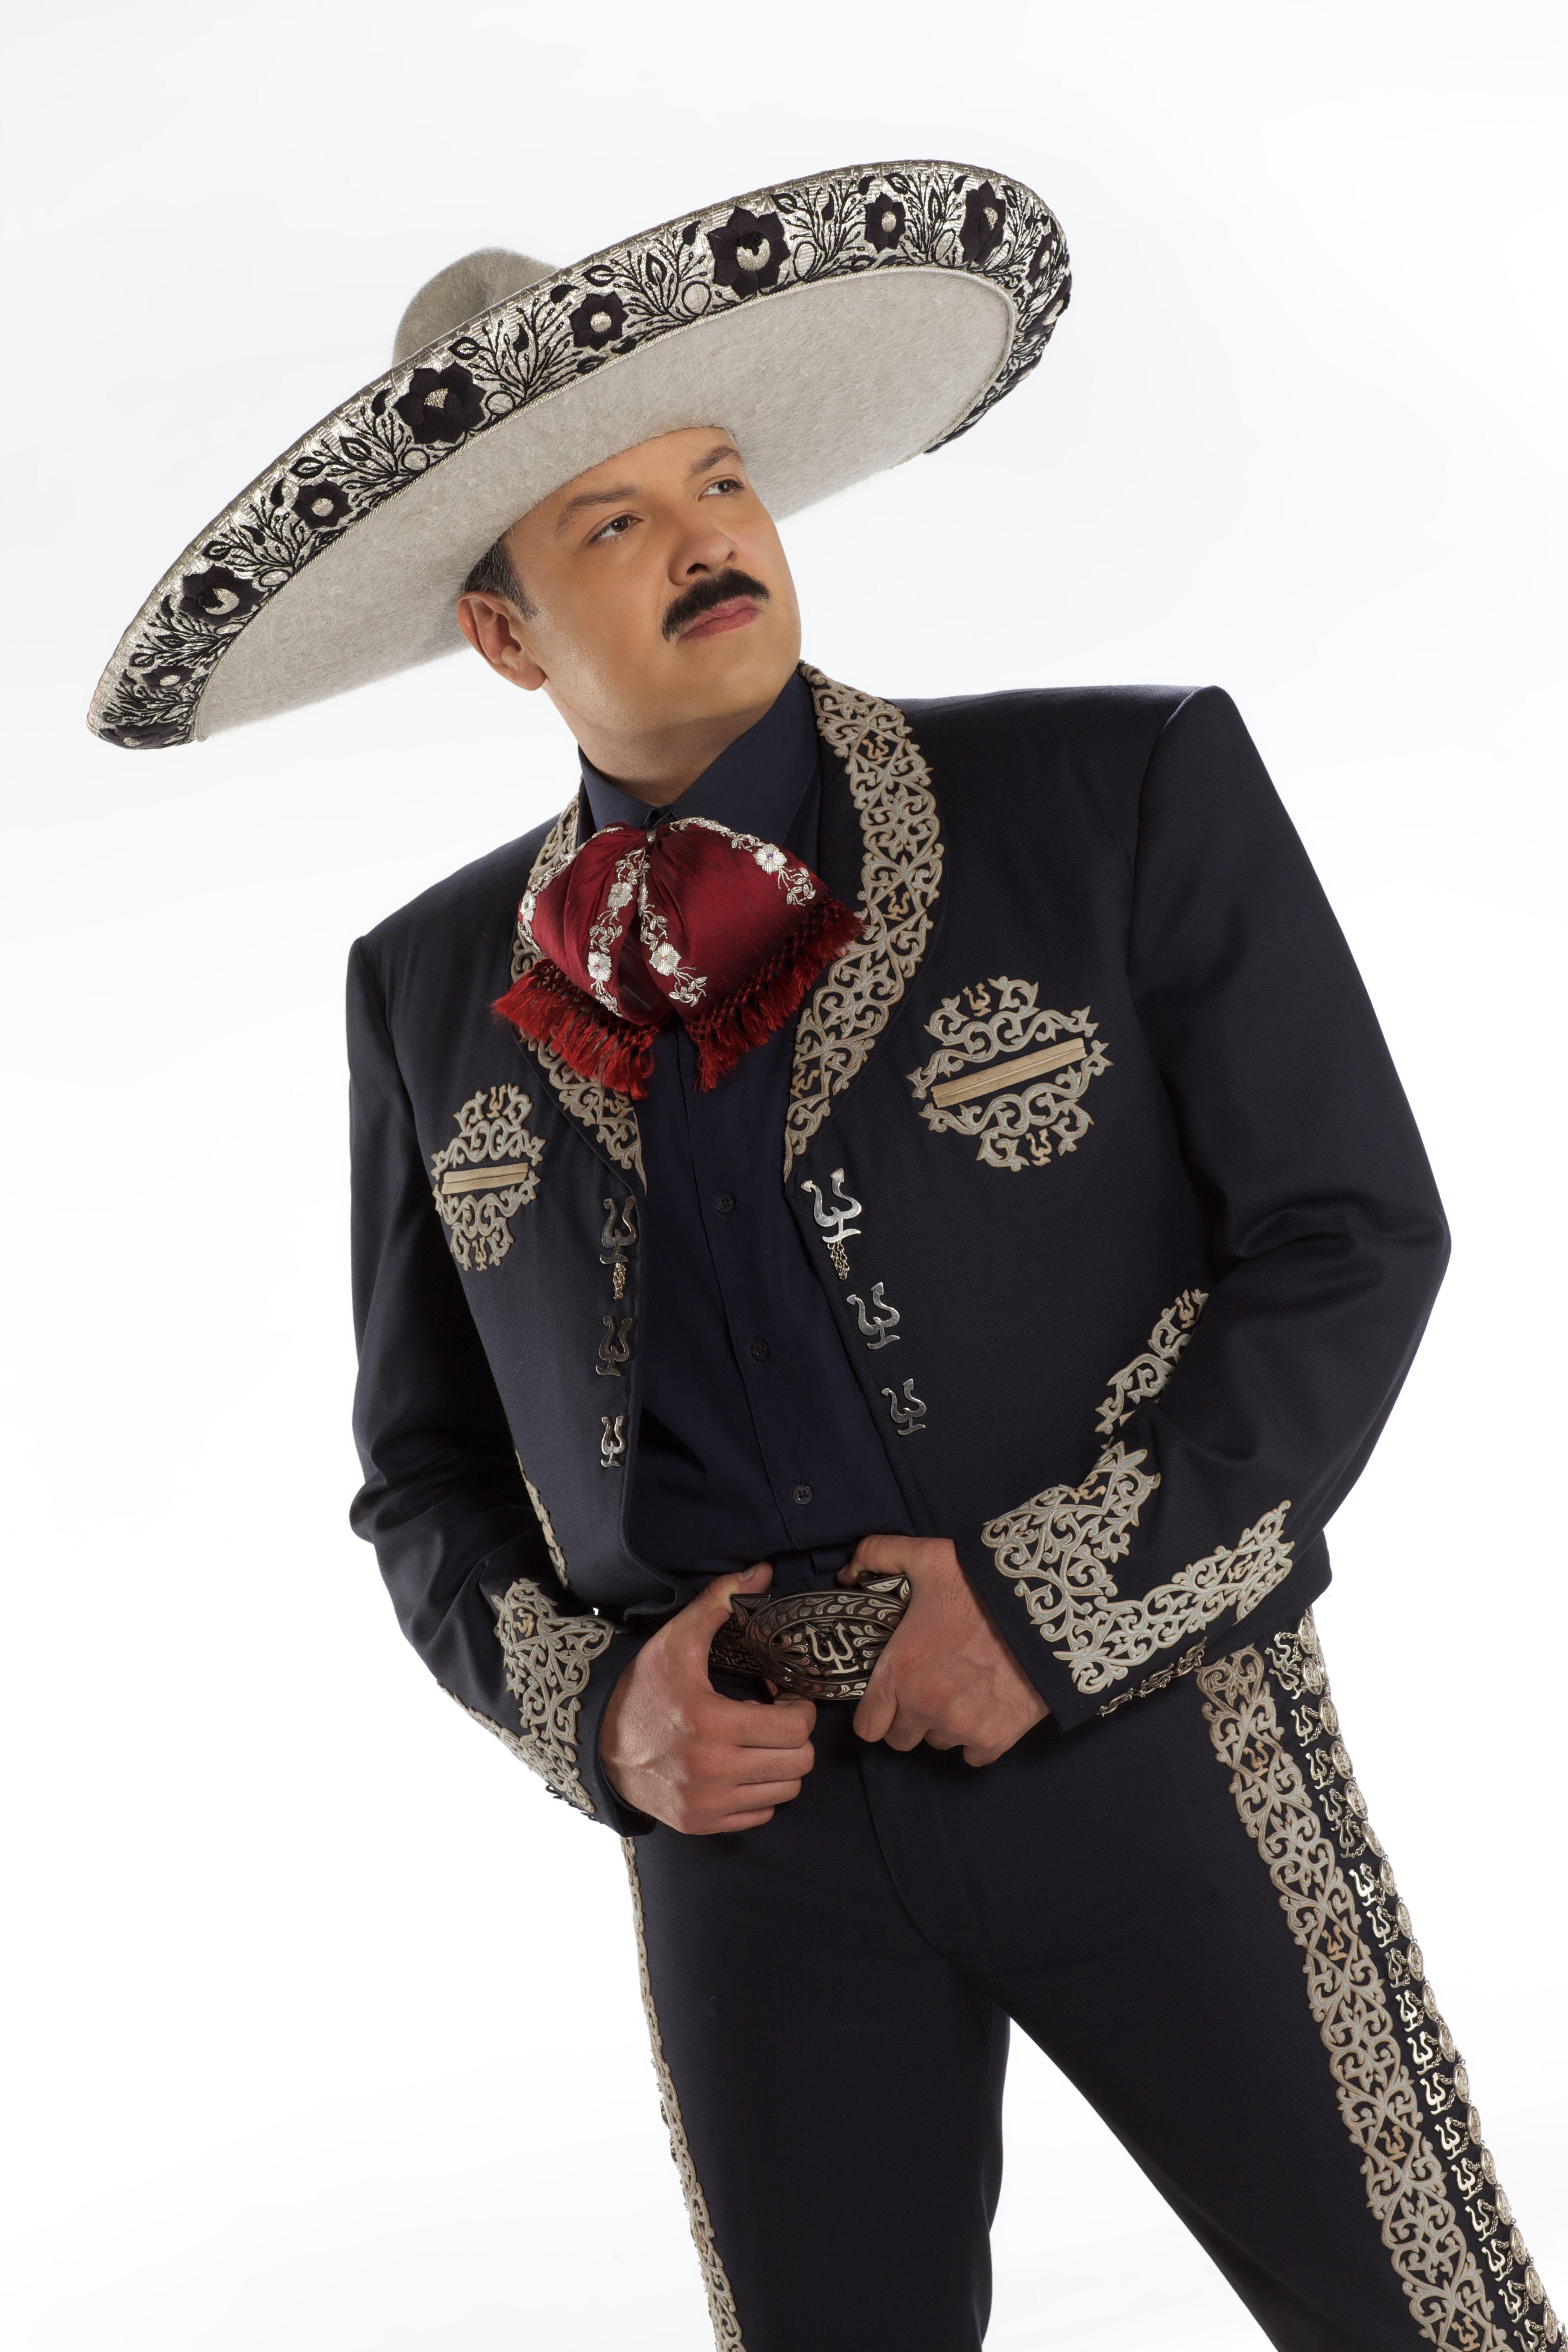 Pepe Aguilar Mariachi Outfit | mariachi band | Rio rancho ...